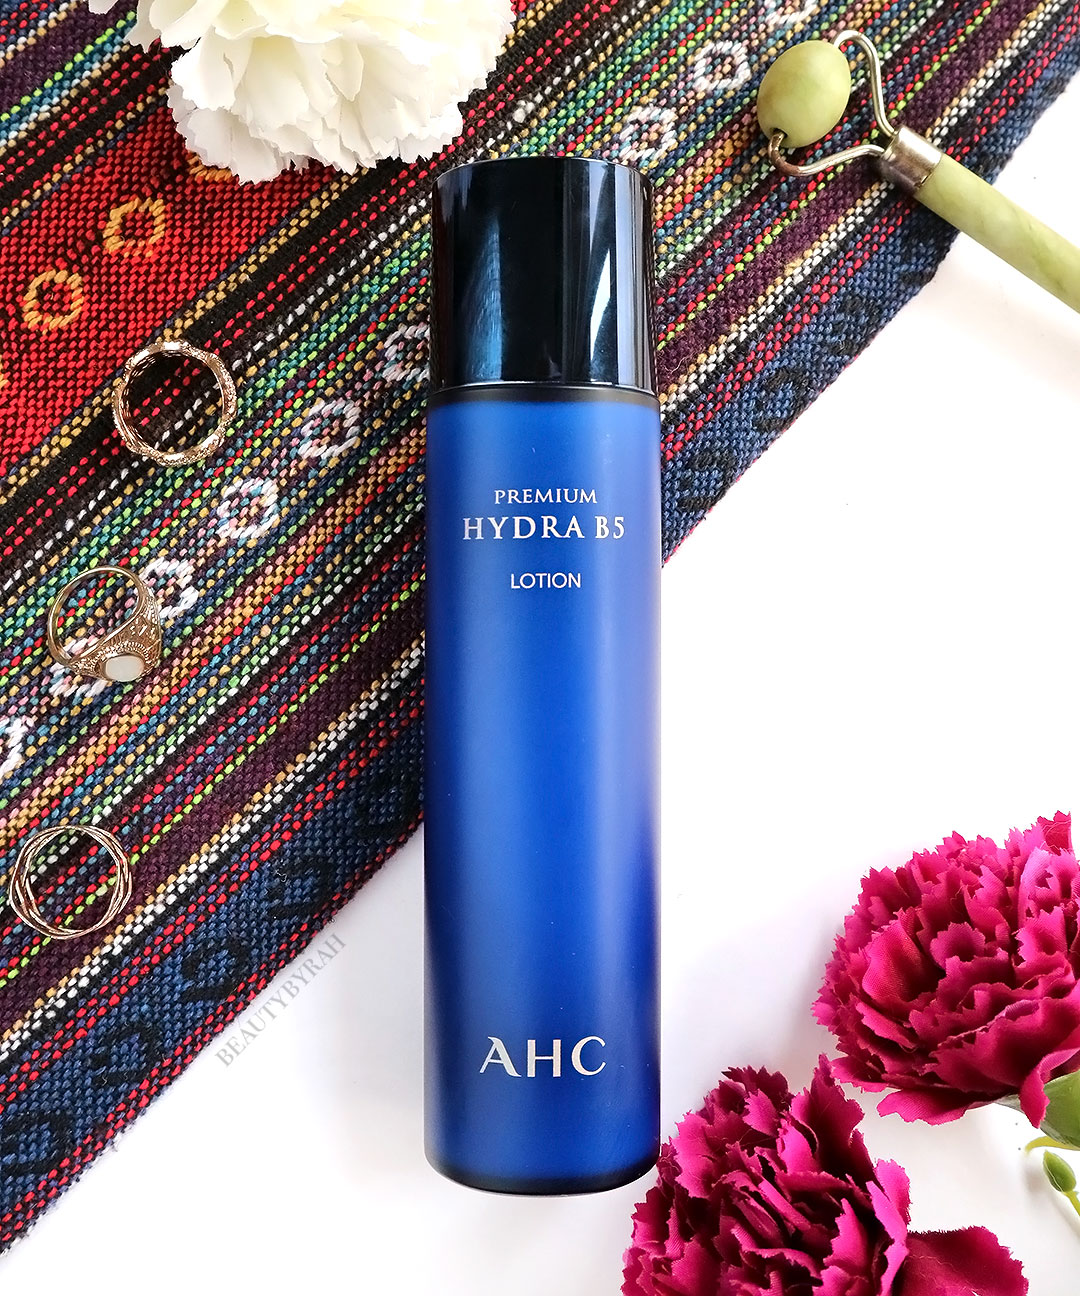 AHC Premium Hydra B5 Lotion Review